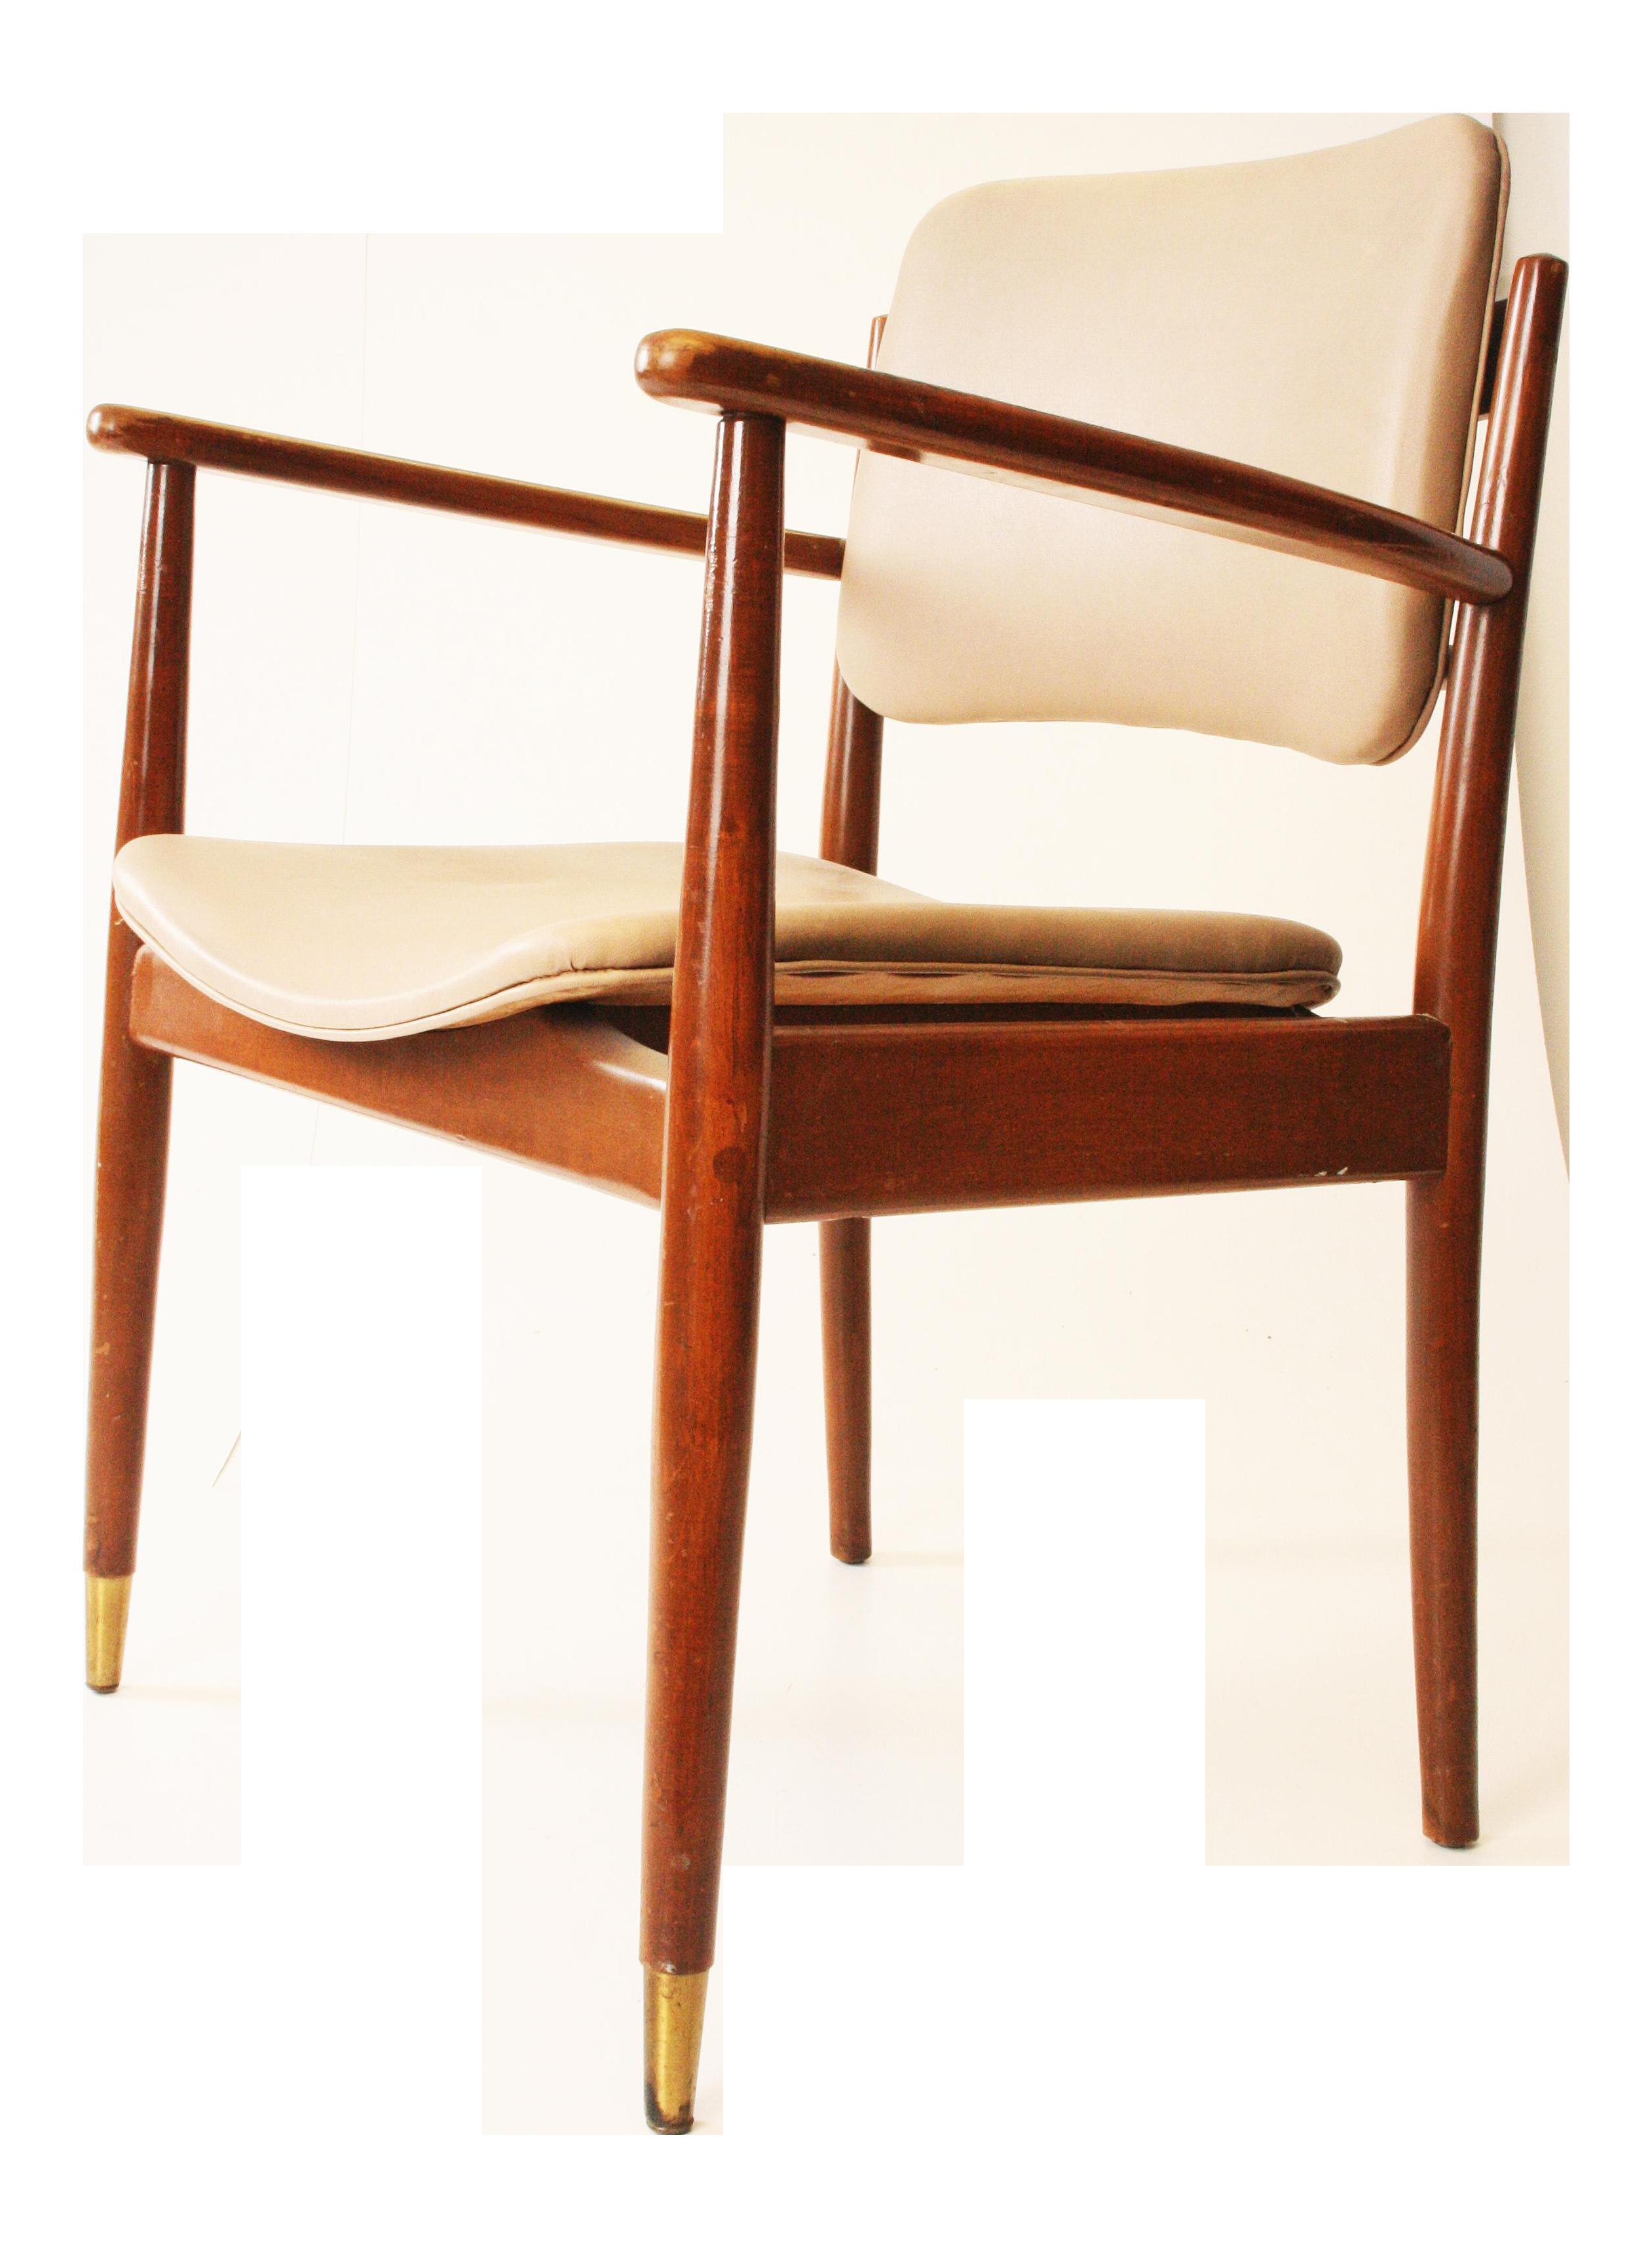 Finest Danish Modern VintageUsed FurnitureDecor